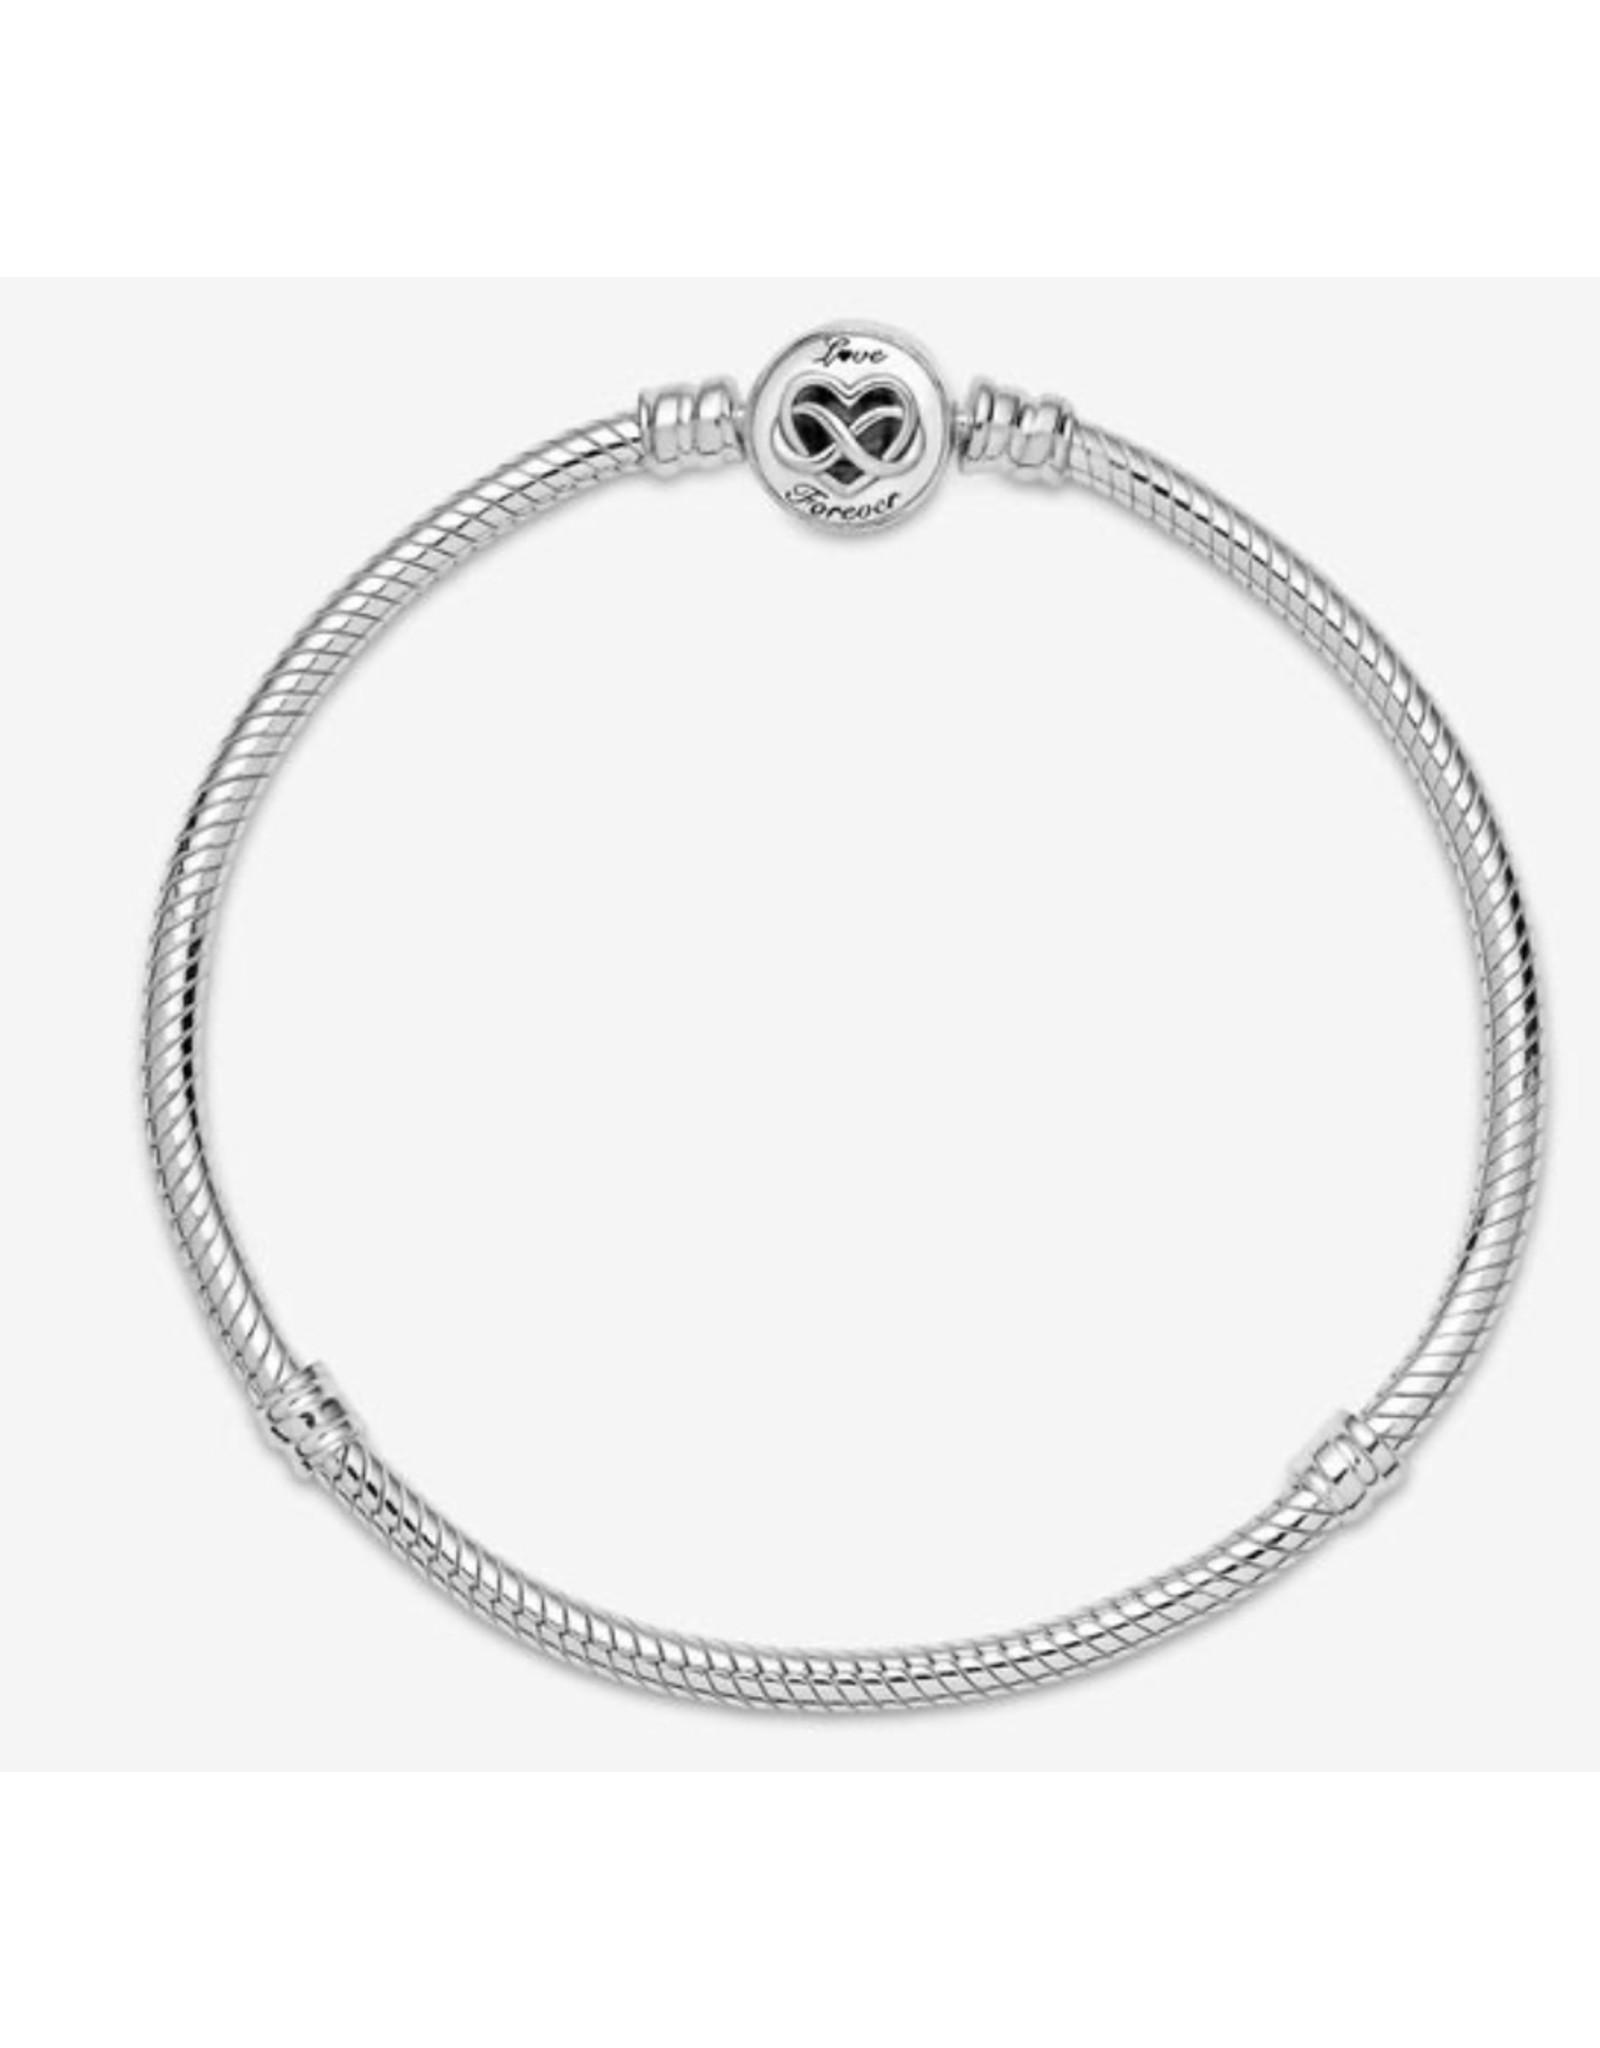 Pandora Pandora Bracelet,599365C00, Heart Infinity Clasp Snake Chain